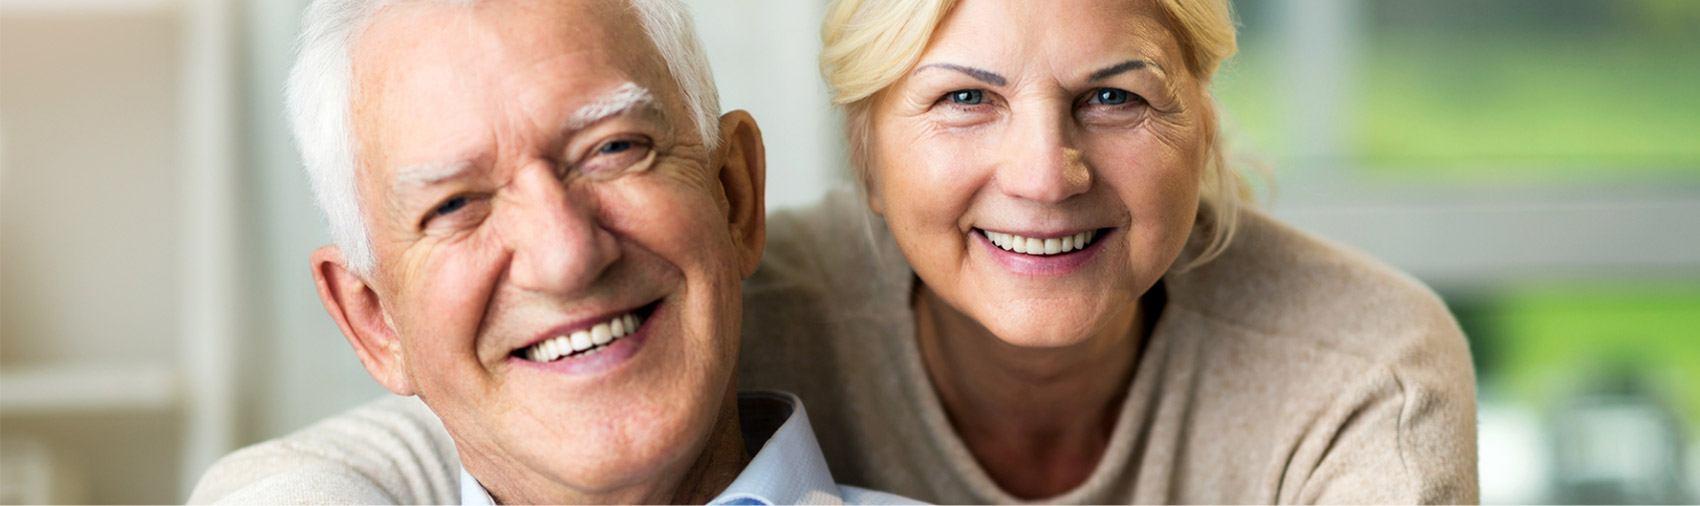 Dental Implants - Meredith Levine, DDS, Inc.